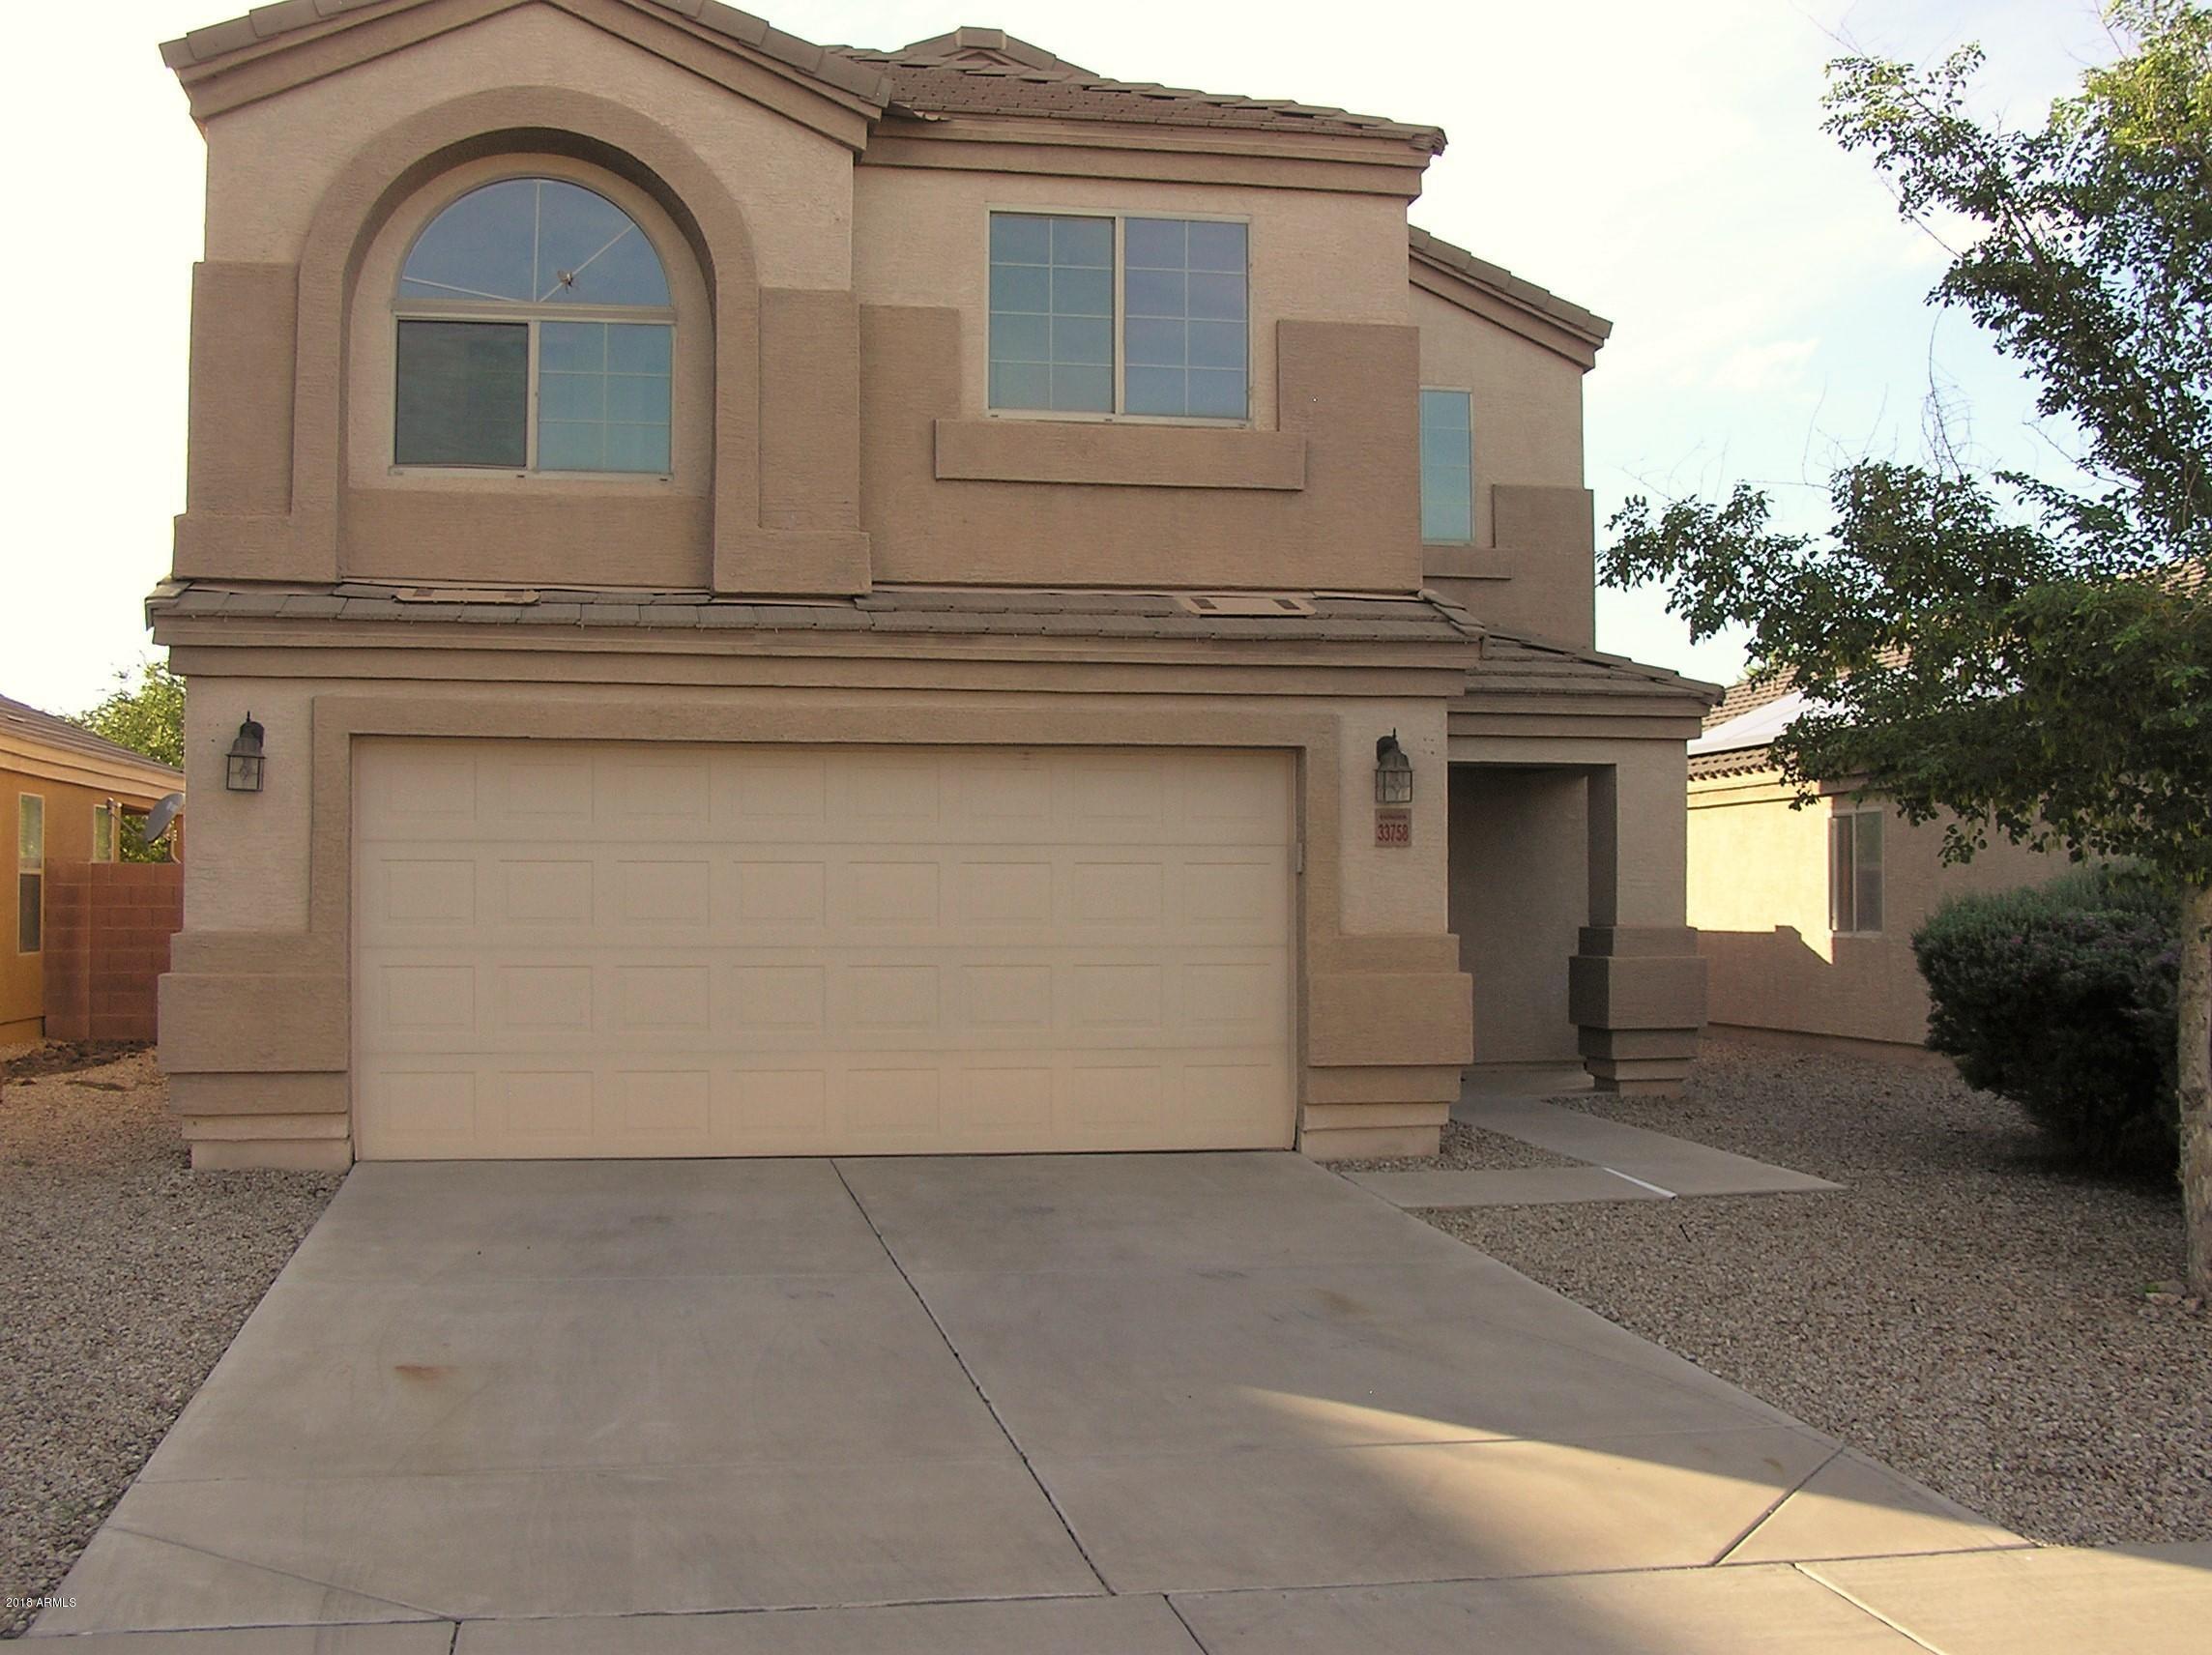 Photo of 33758 N ROADRUNNER Lane, Queen Creek, AZ 85142